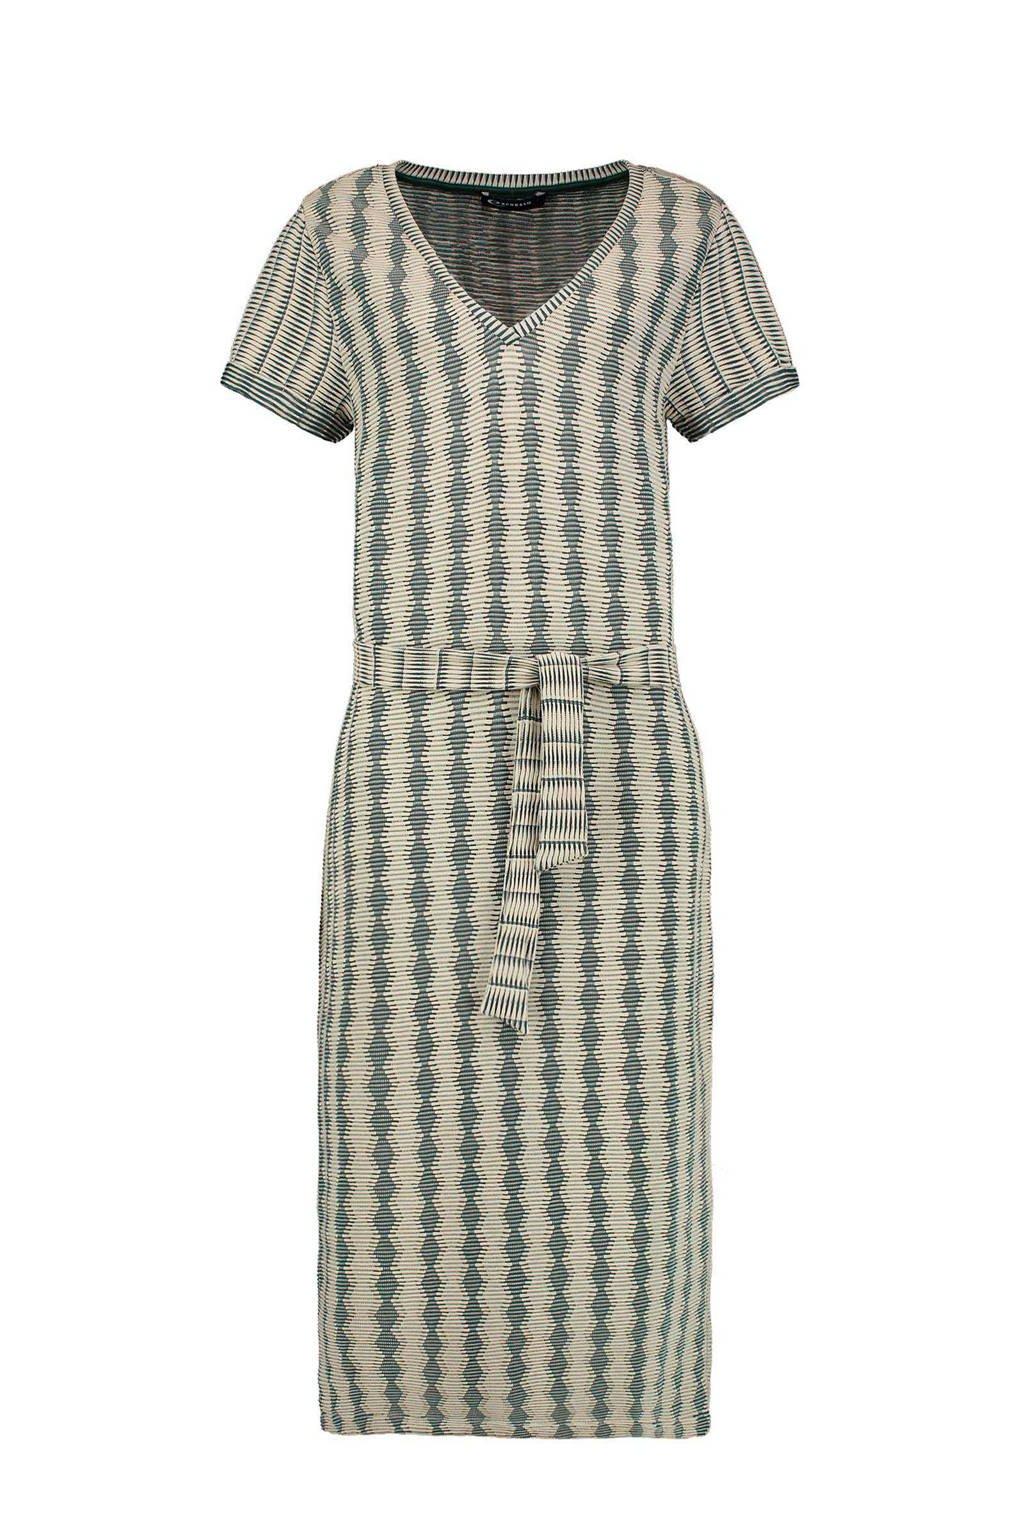 Expresso jurk met all over print en ceintuur zand/kaki, Zand/kaki